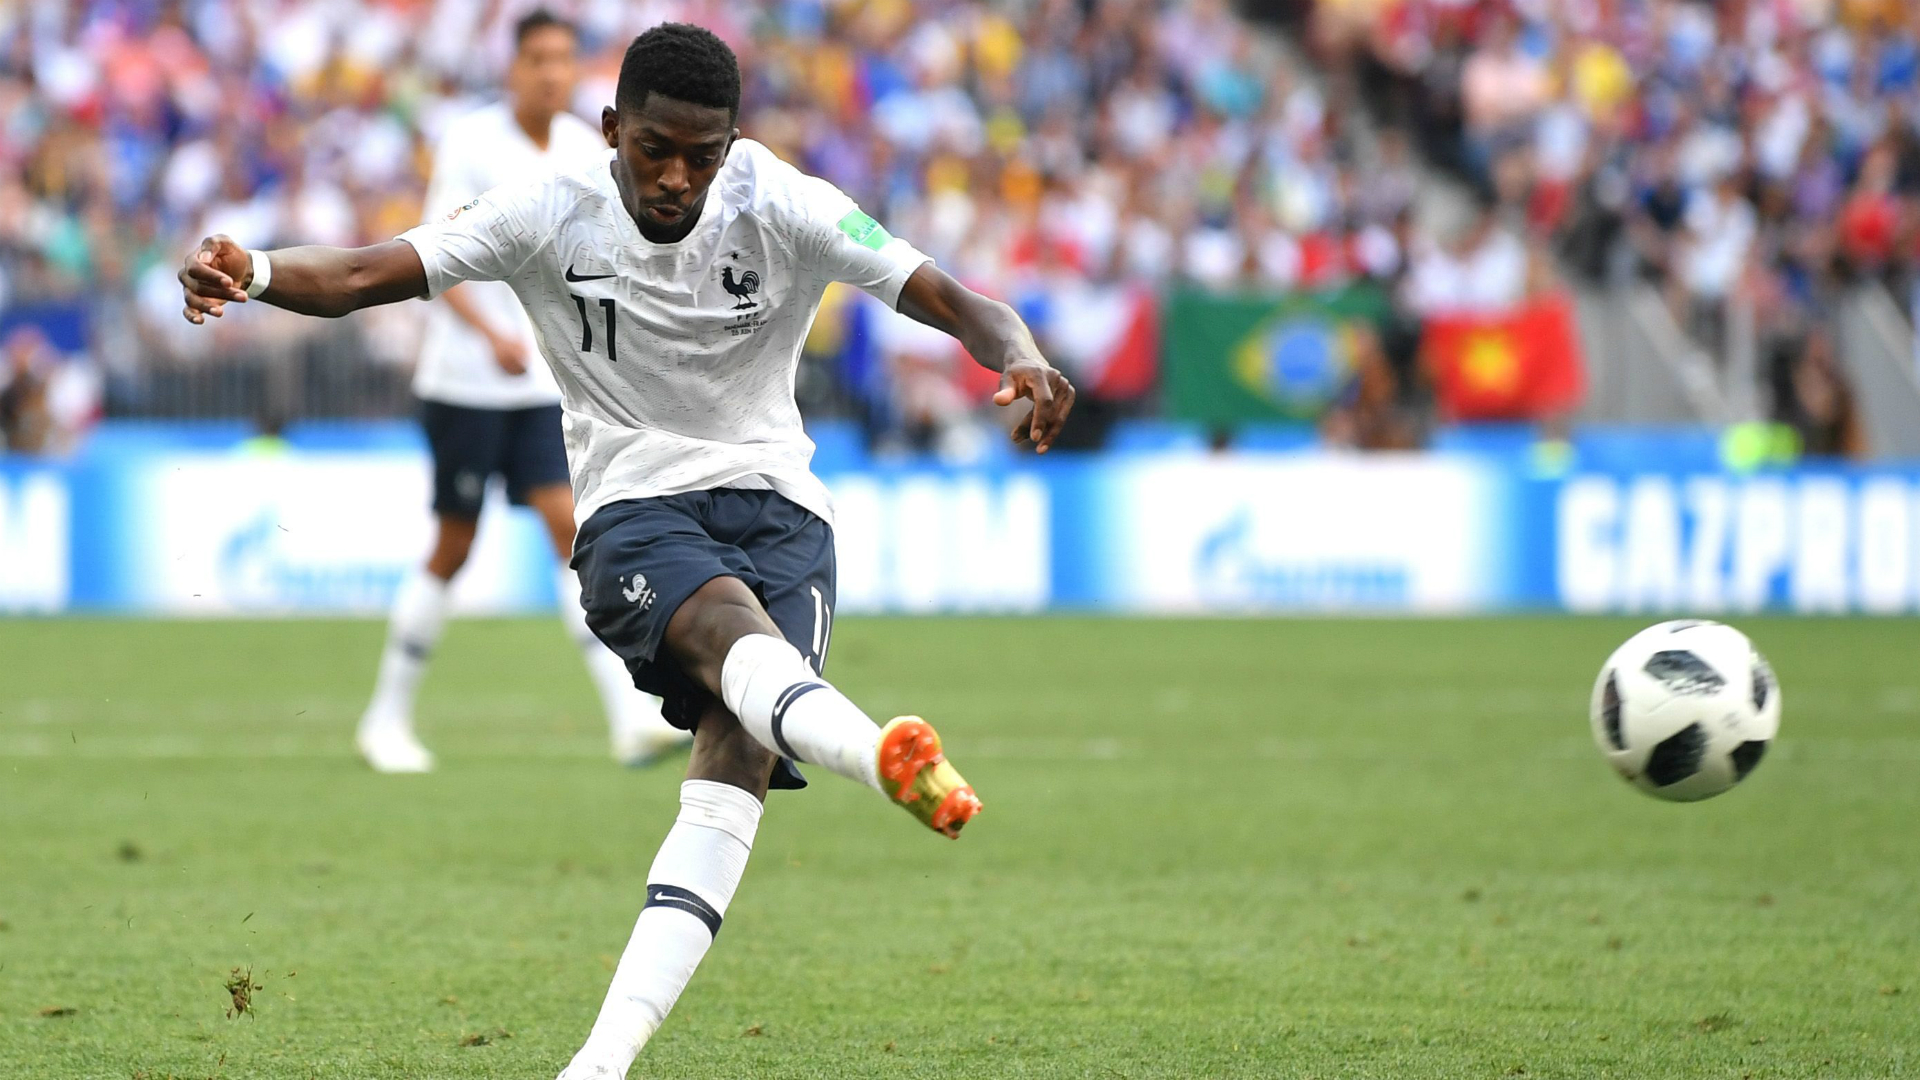 Ousmane Dembele Denmark France Cup 26062018.jpg